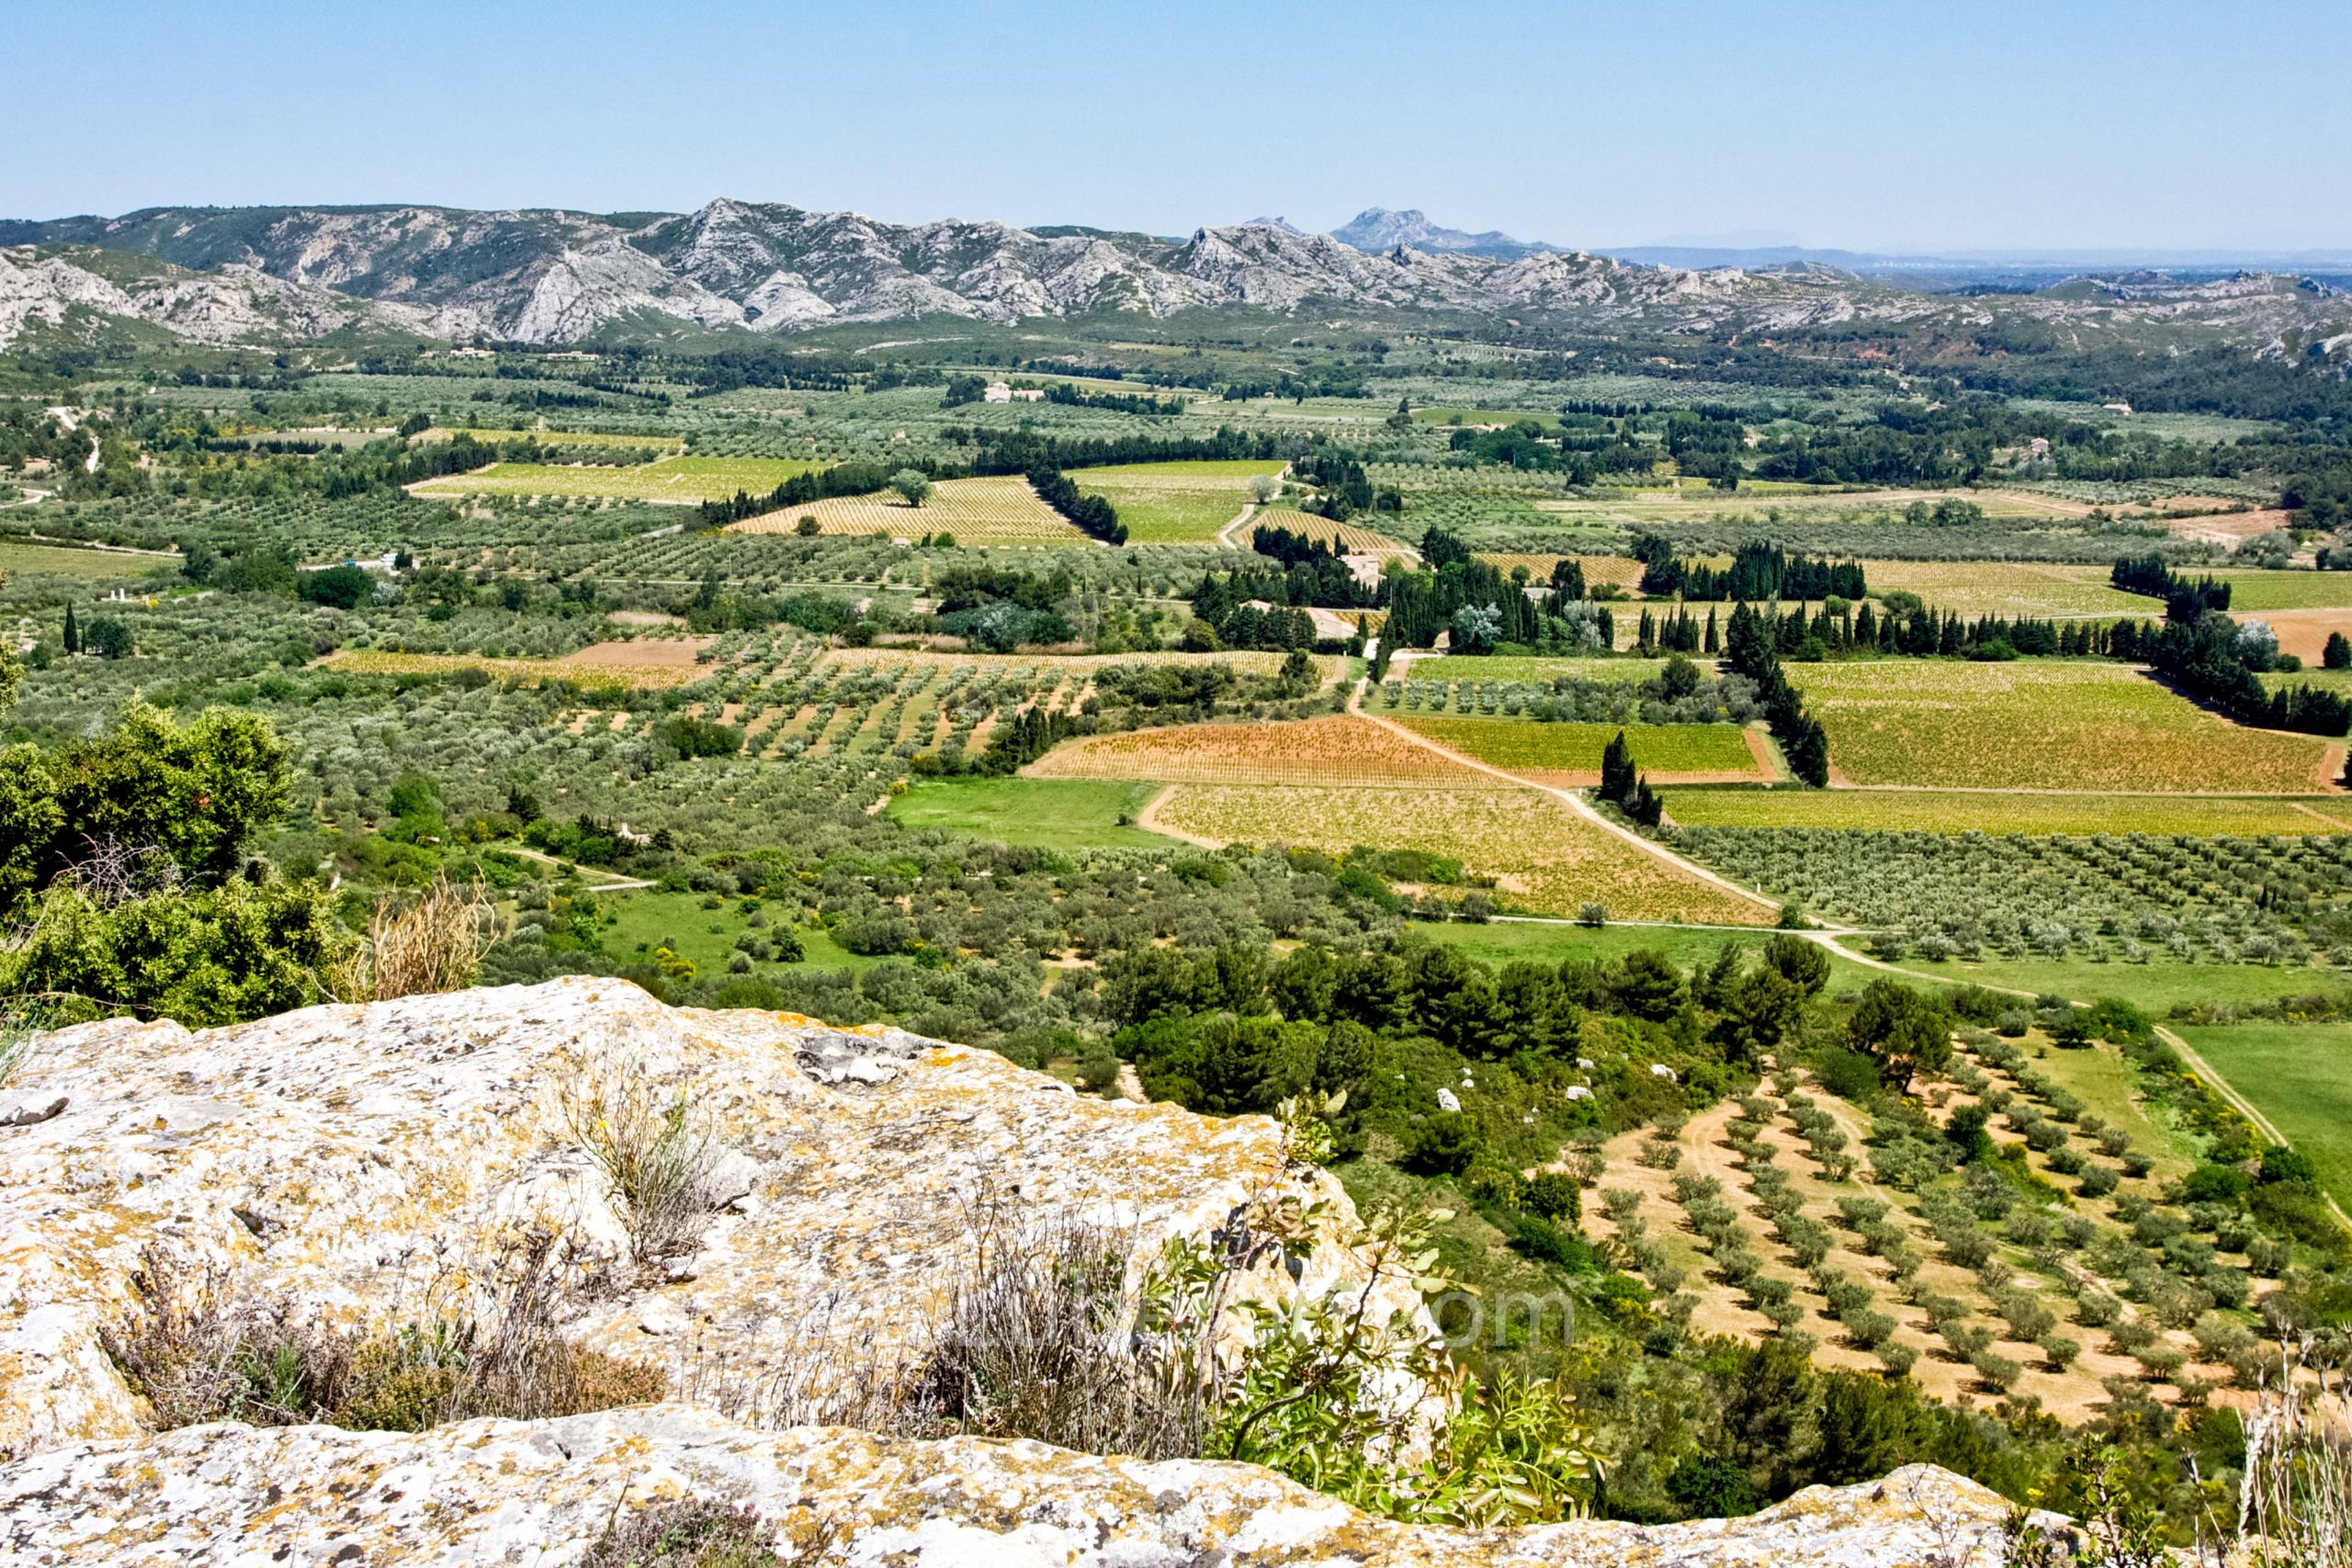 Vista from Les Baux-de-Provence